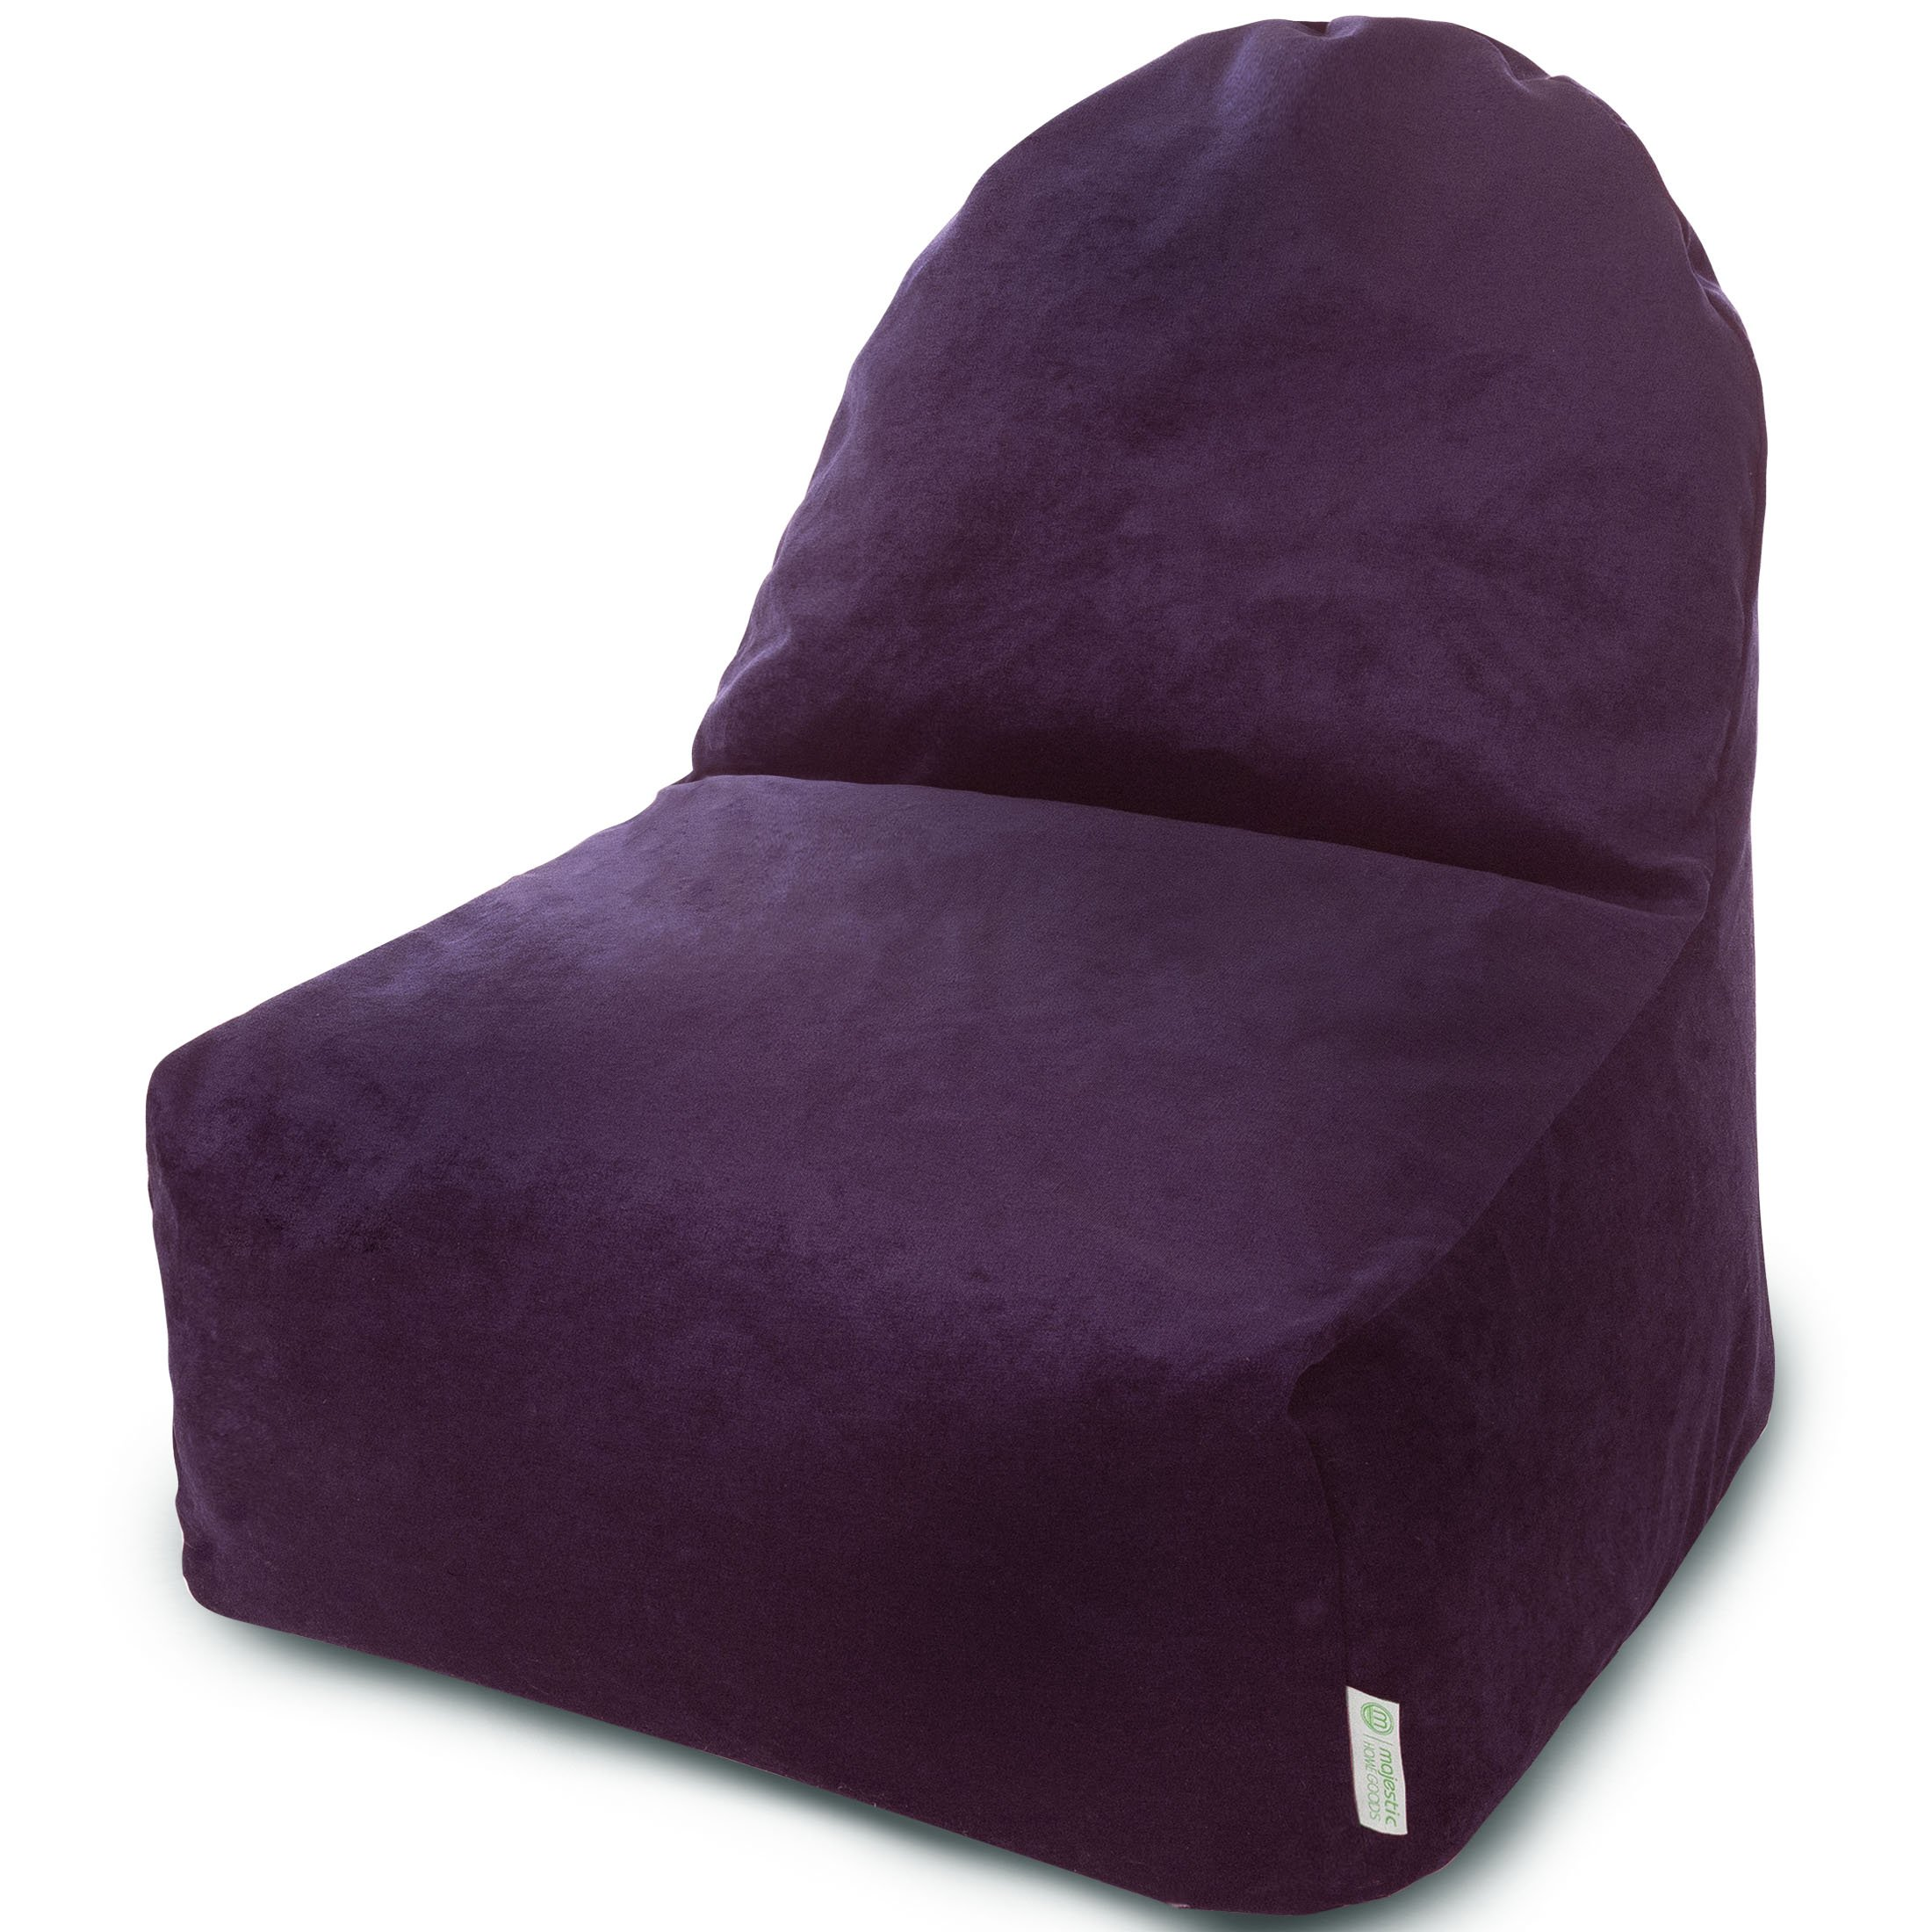 Majestic Home Goods Villa Aubergine Kick-It Chair